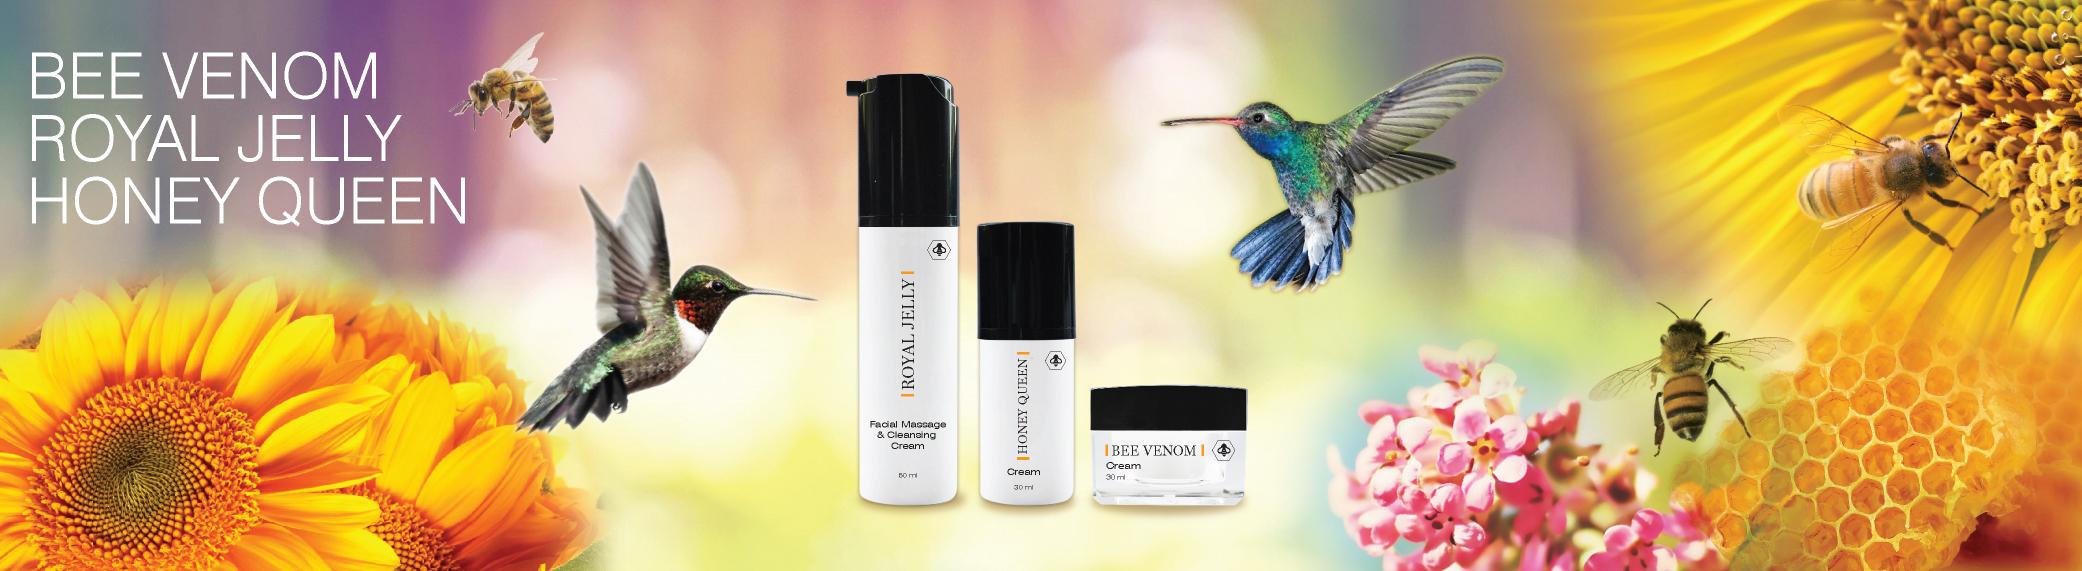 Home - ziampro com OEM Private Label Cosmetics Skin Care